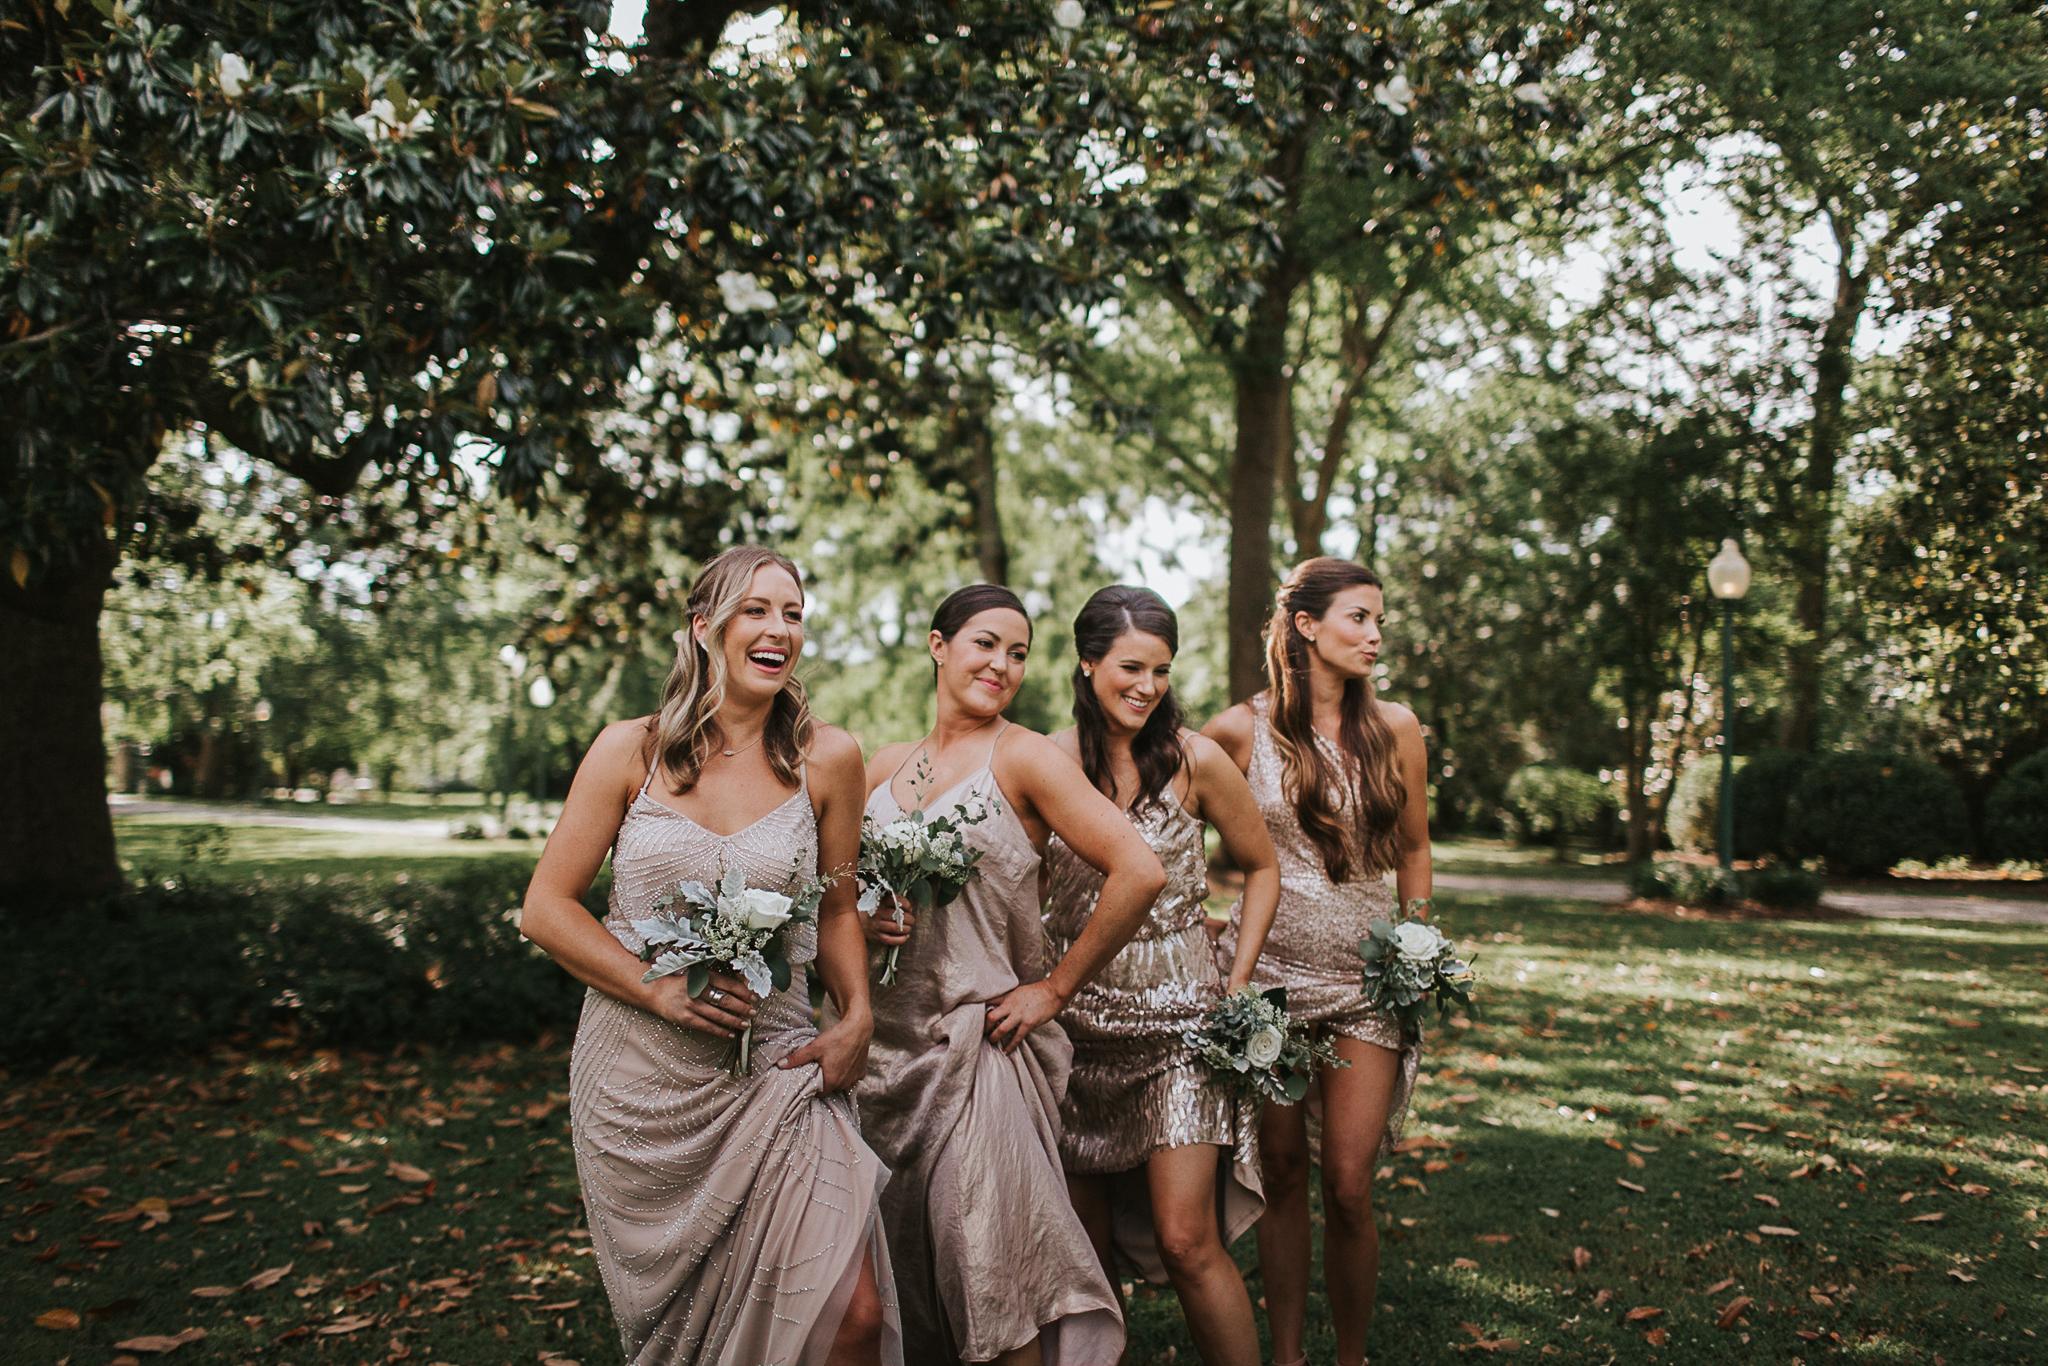 best-wedding-photographers-nashville-tn-31.jpg